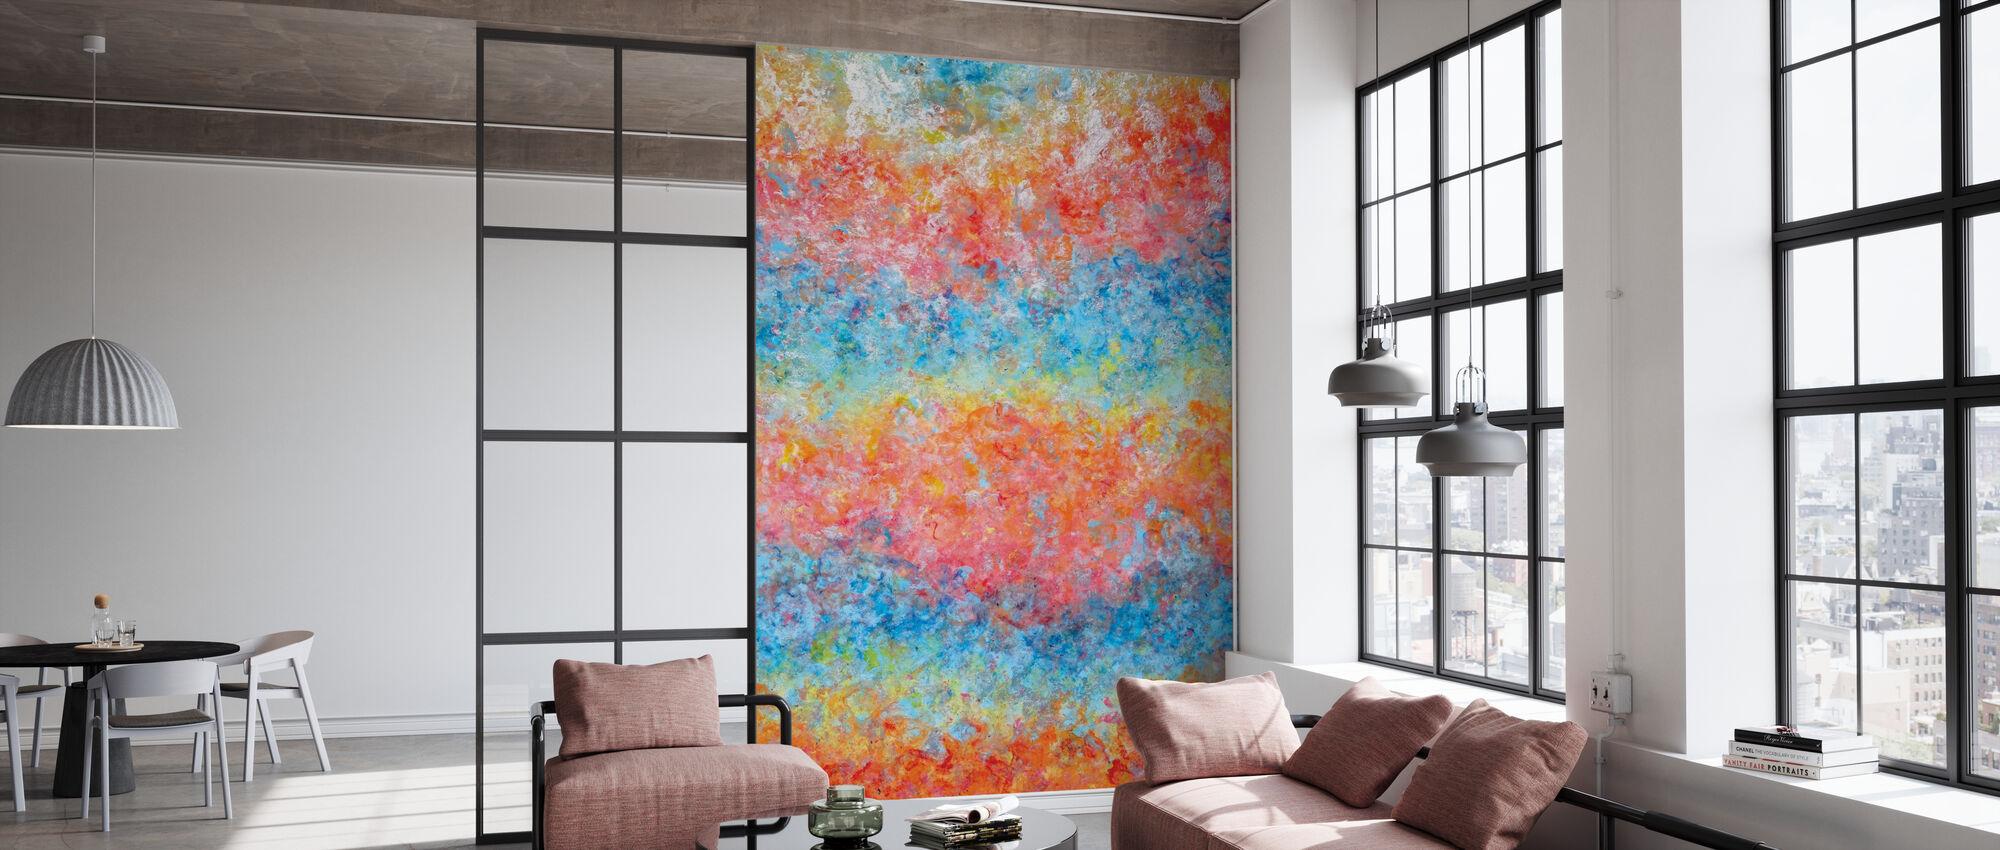 Aurora - Wallpaper - Office